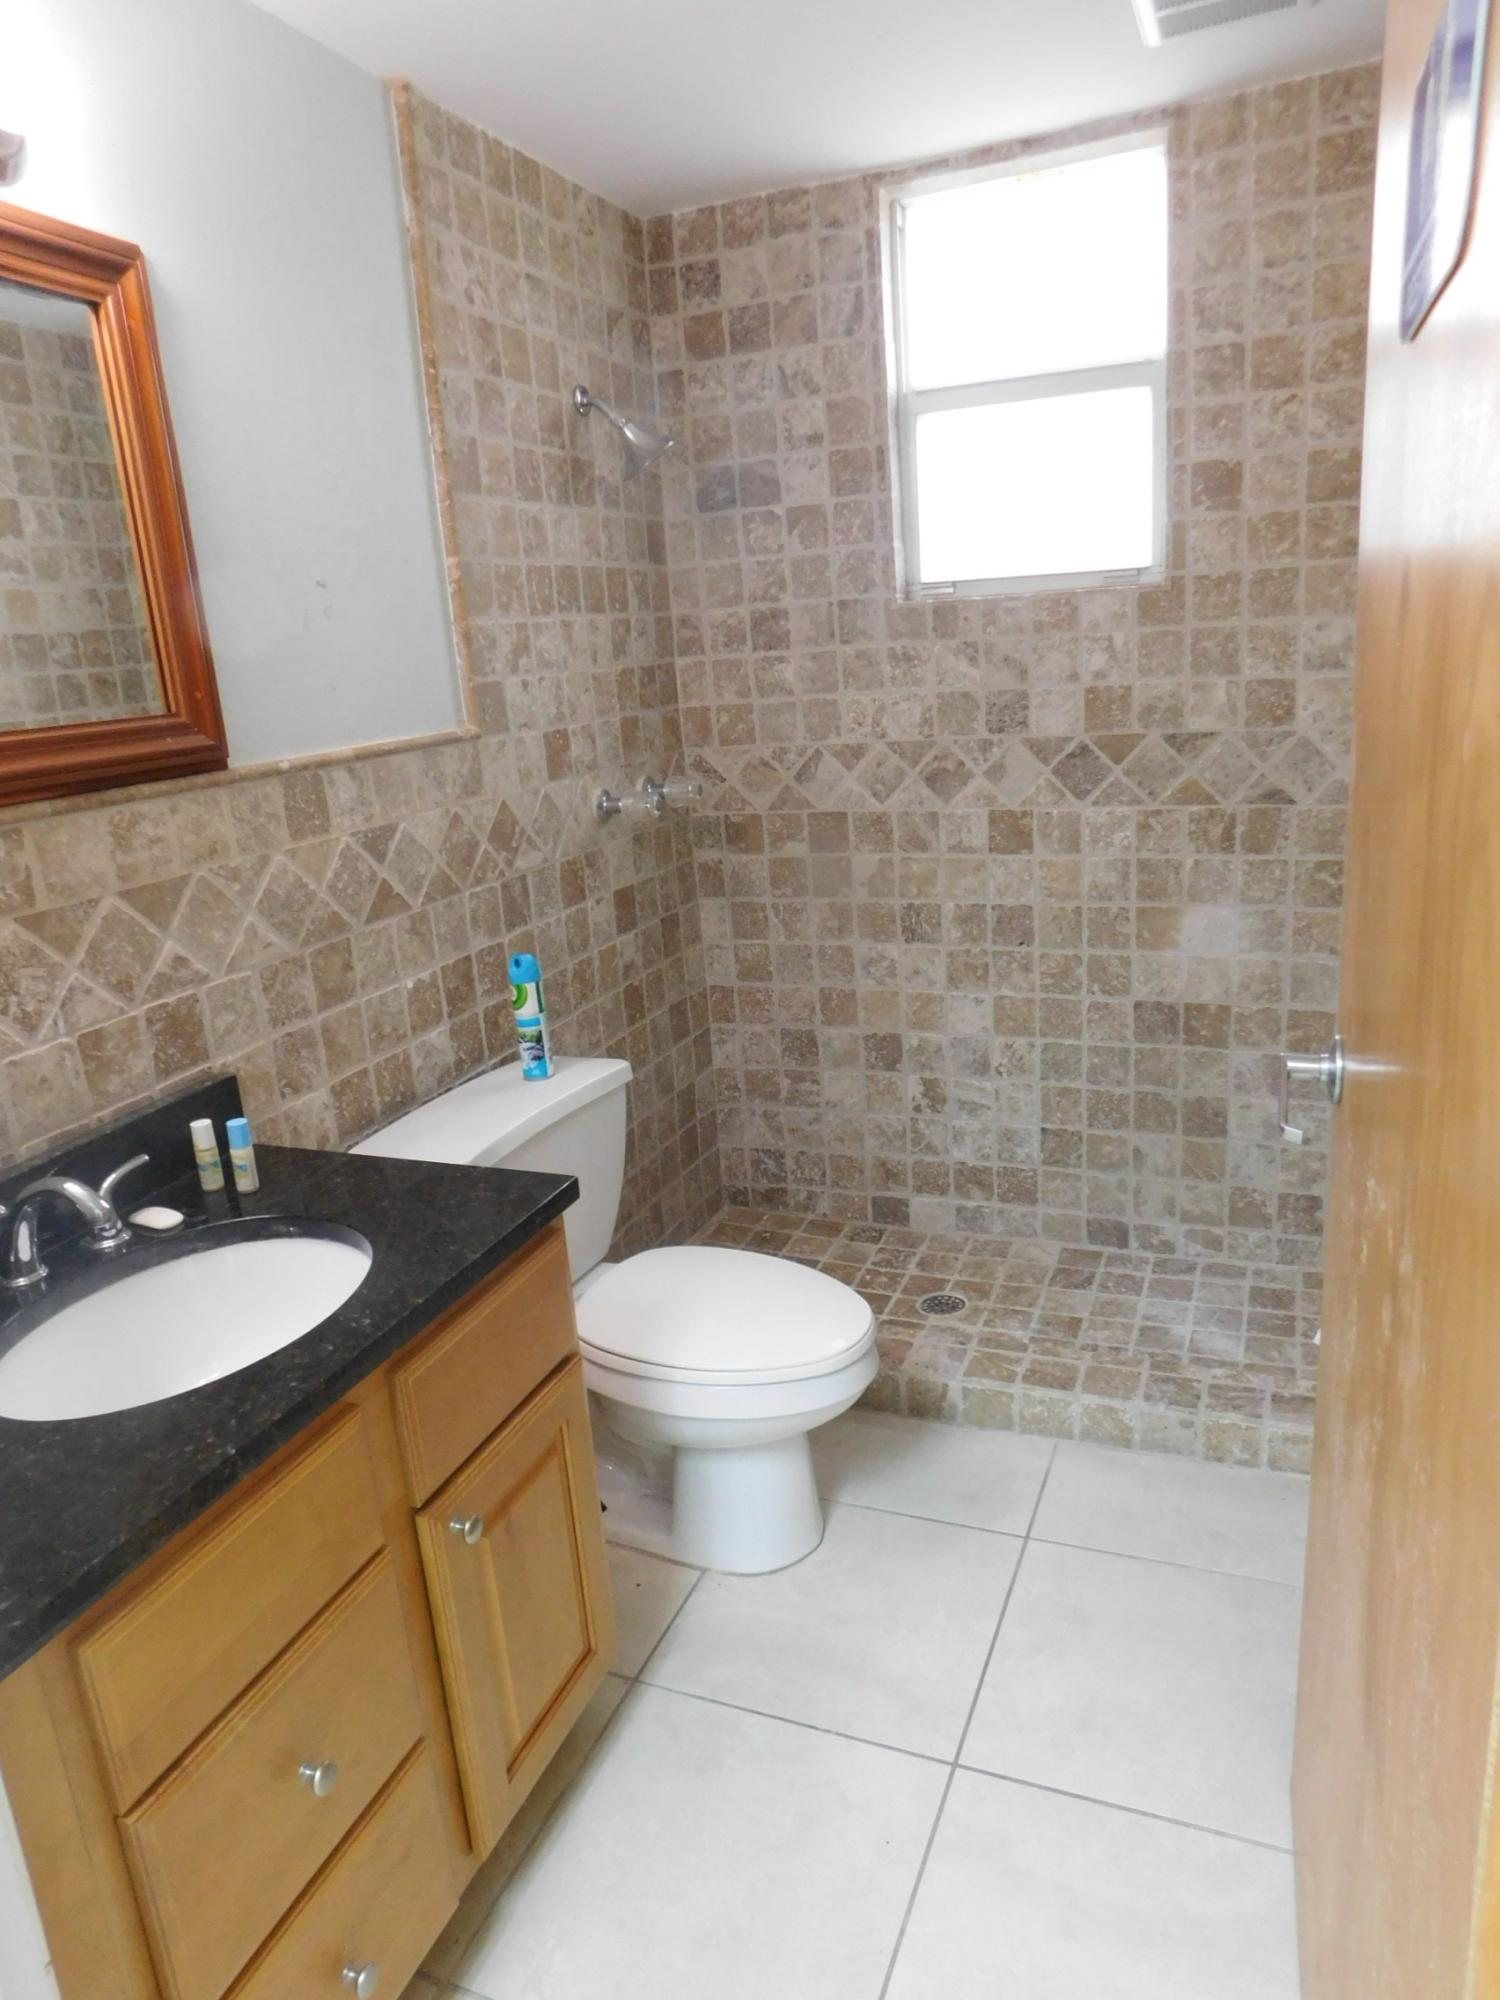 6th st bathroom 3